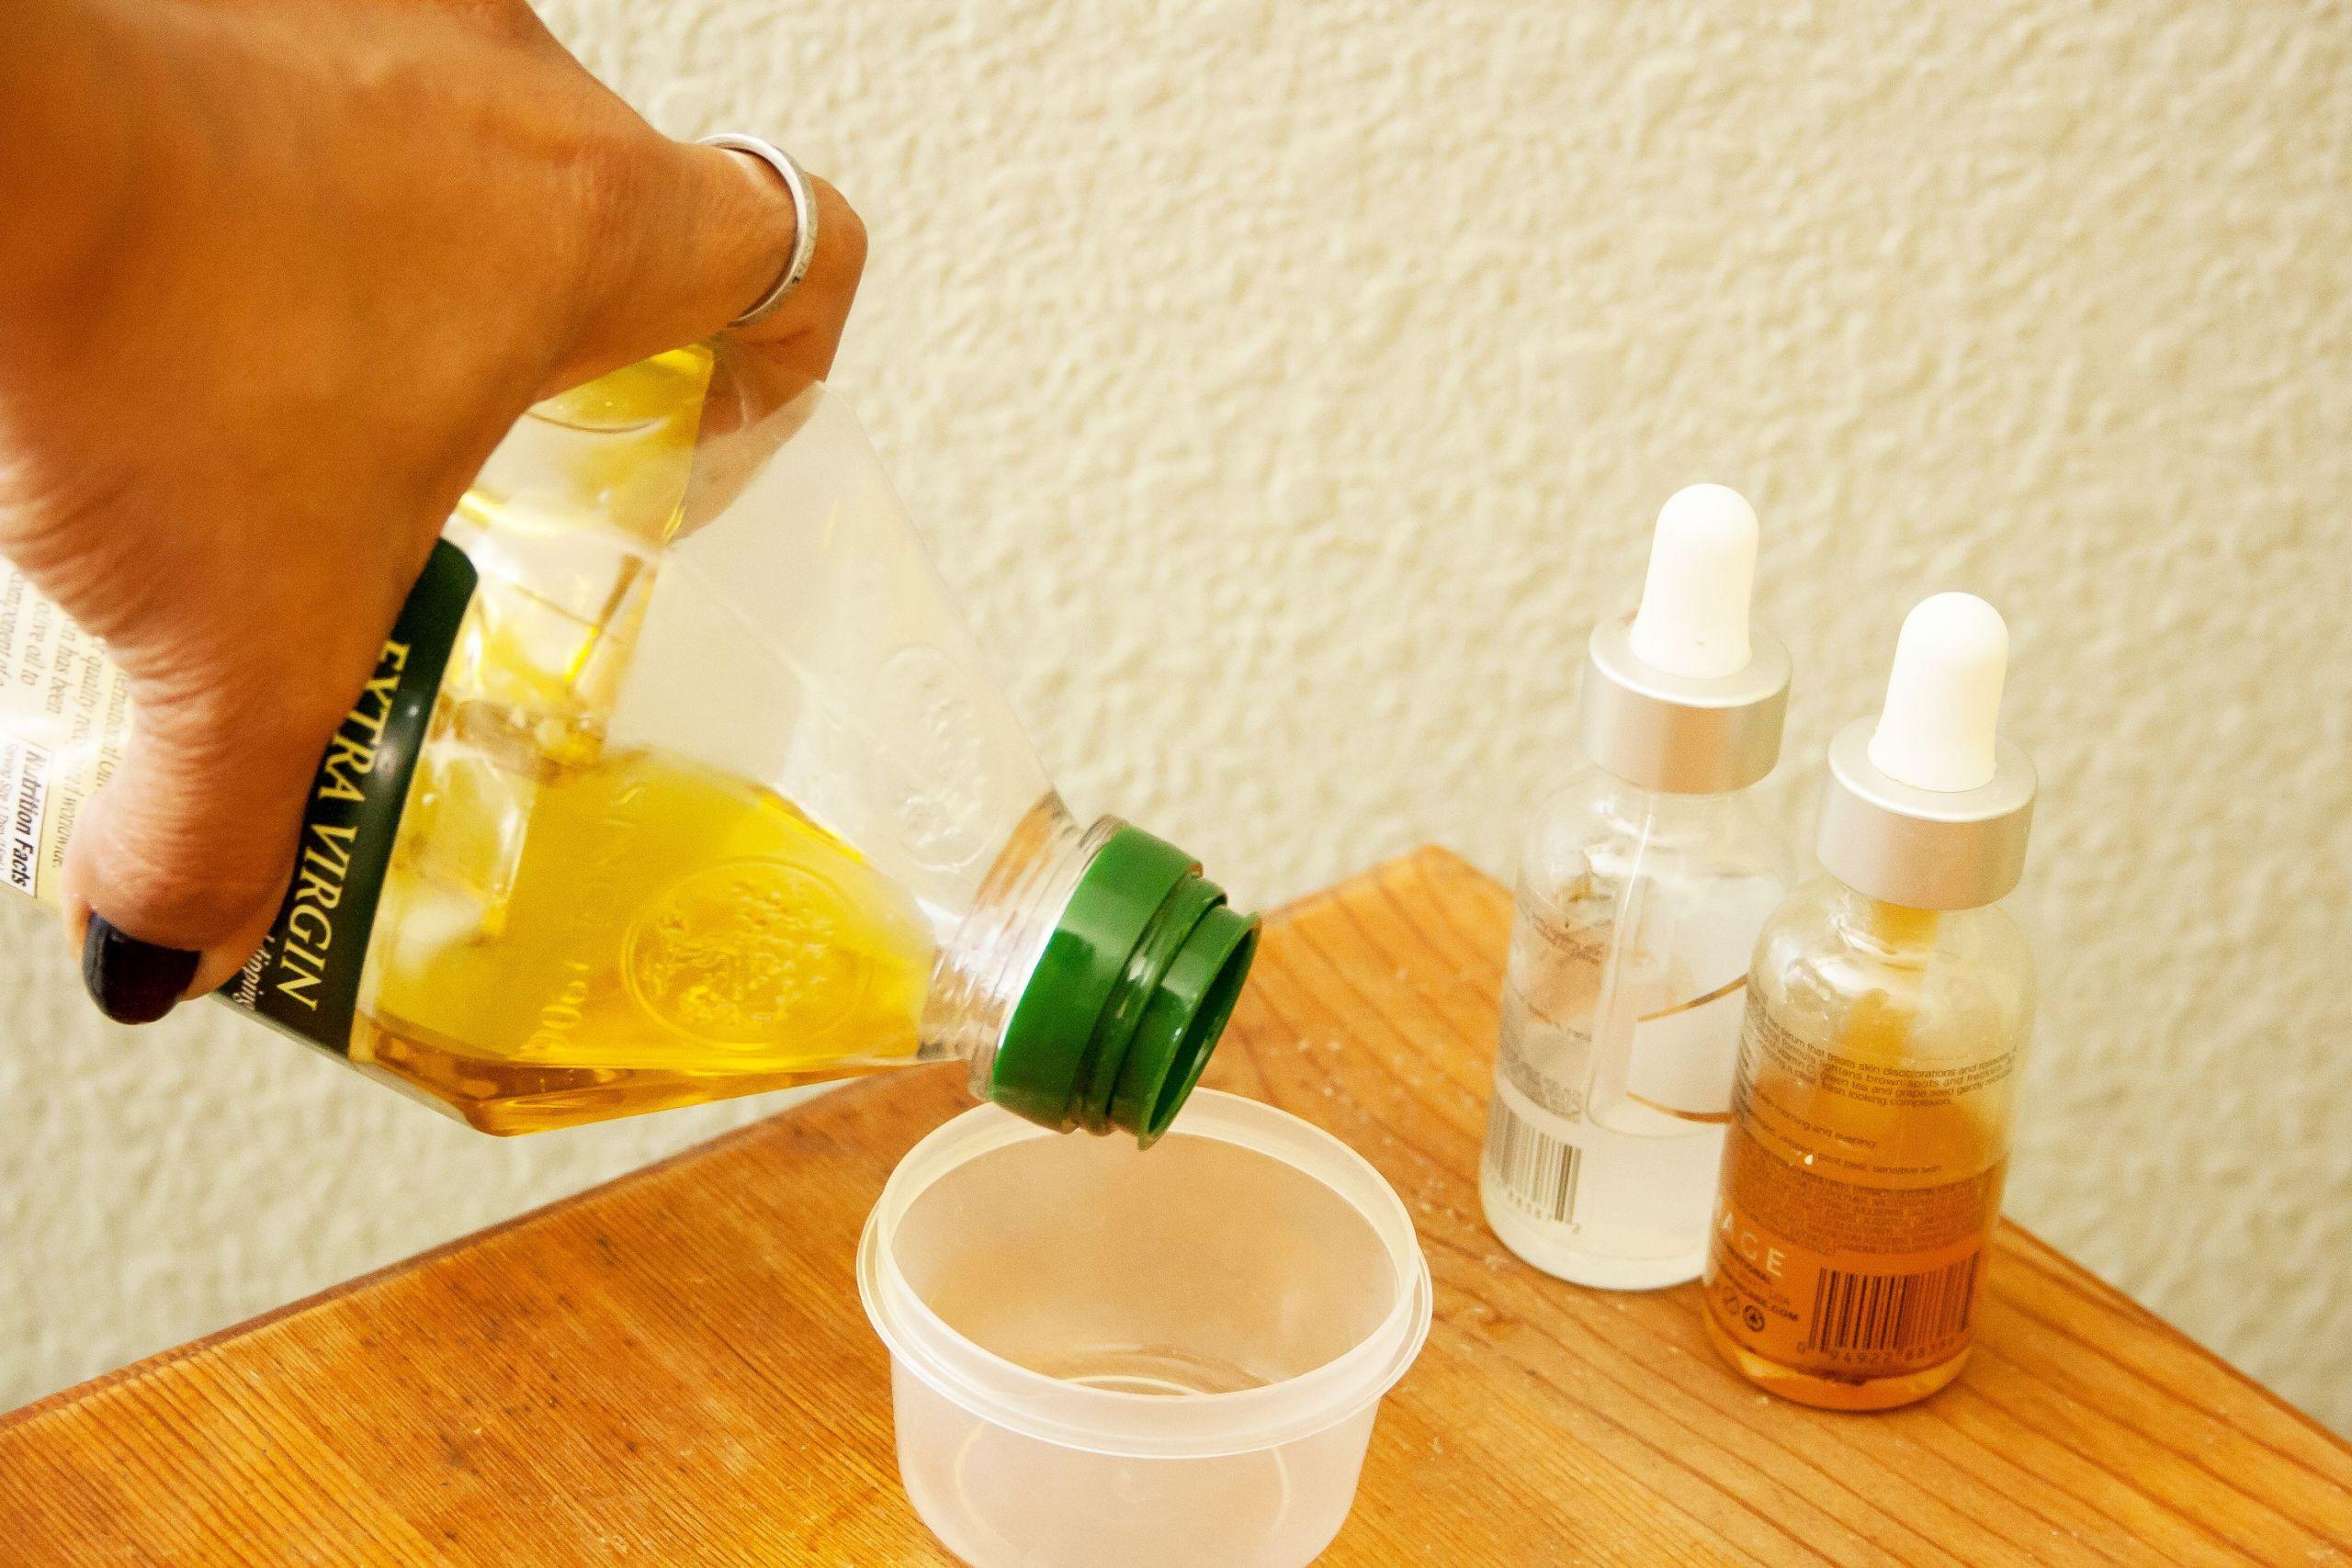 DIY Hot Oil Treatment For Damaged Hair  Hot Oil Treatments for Relaxed Hair